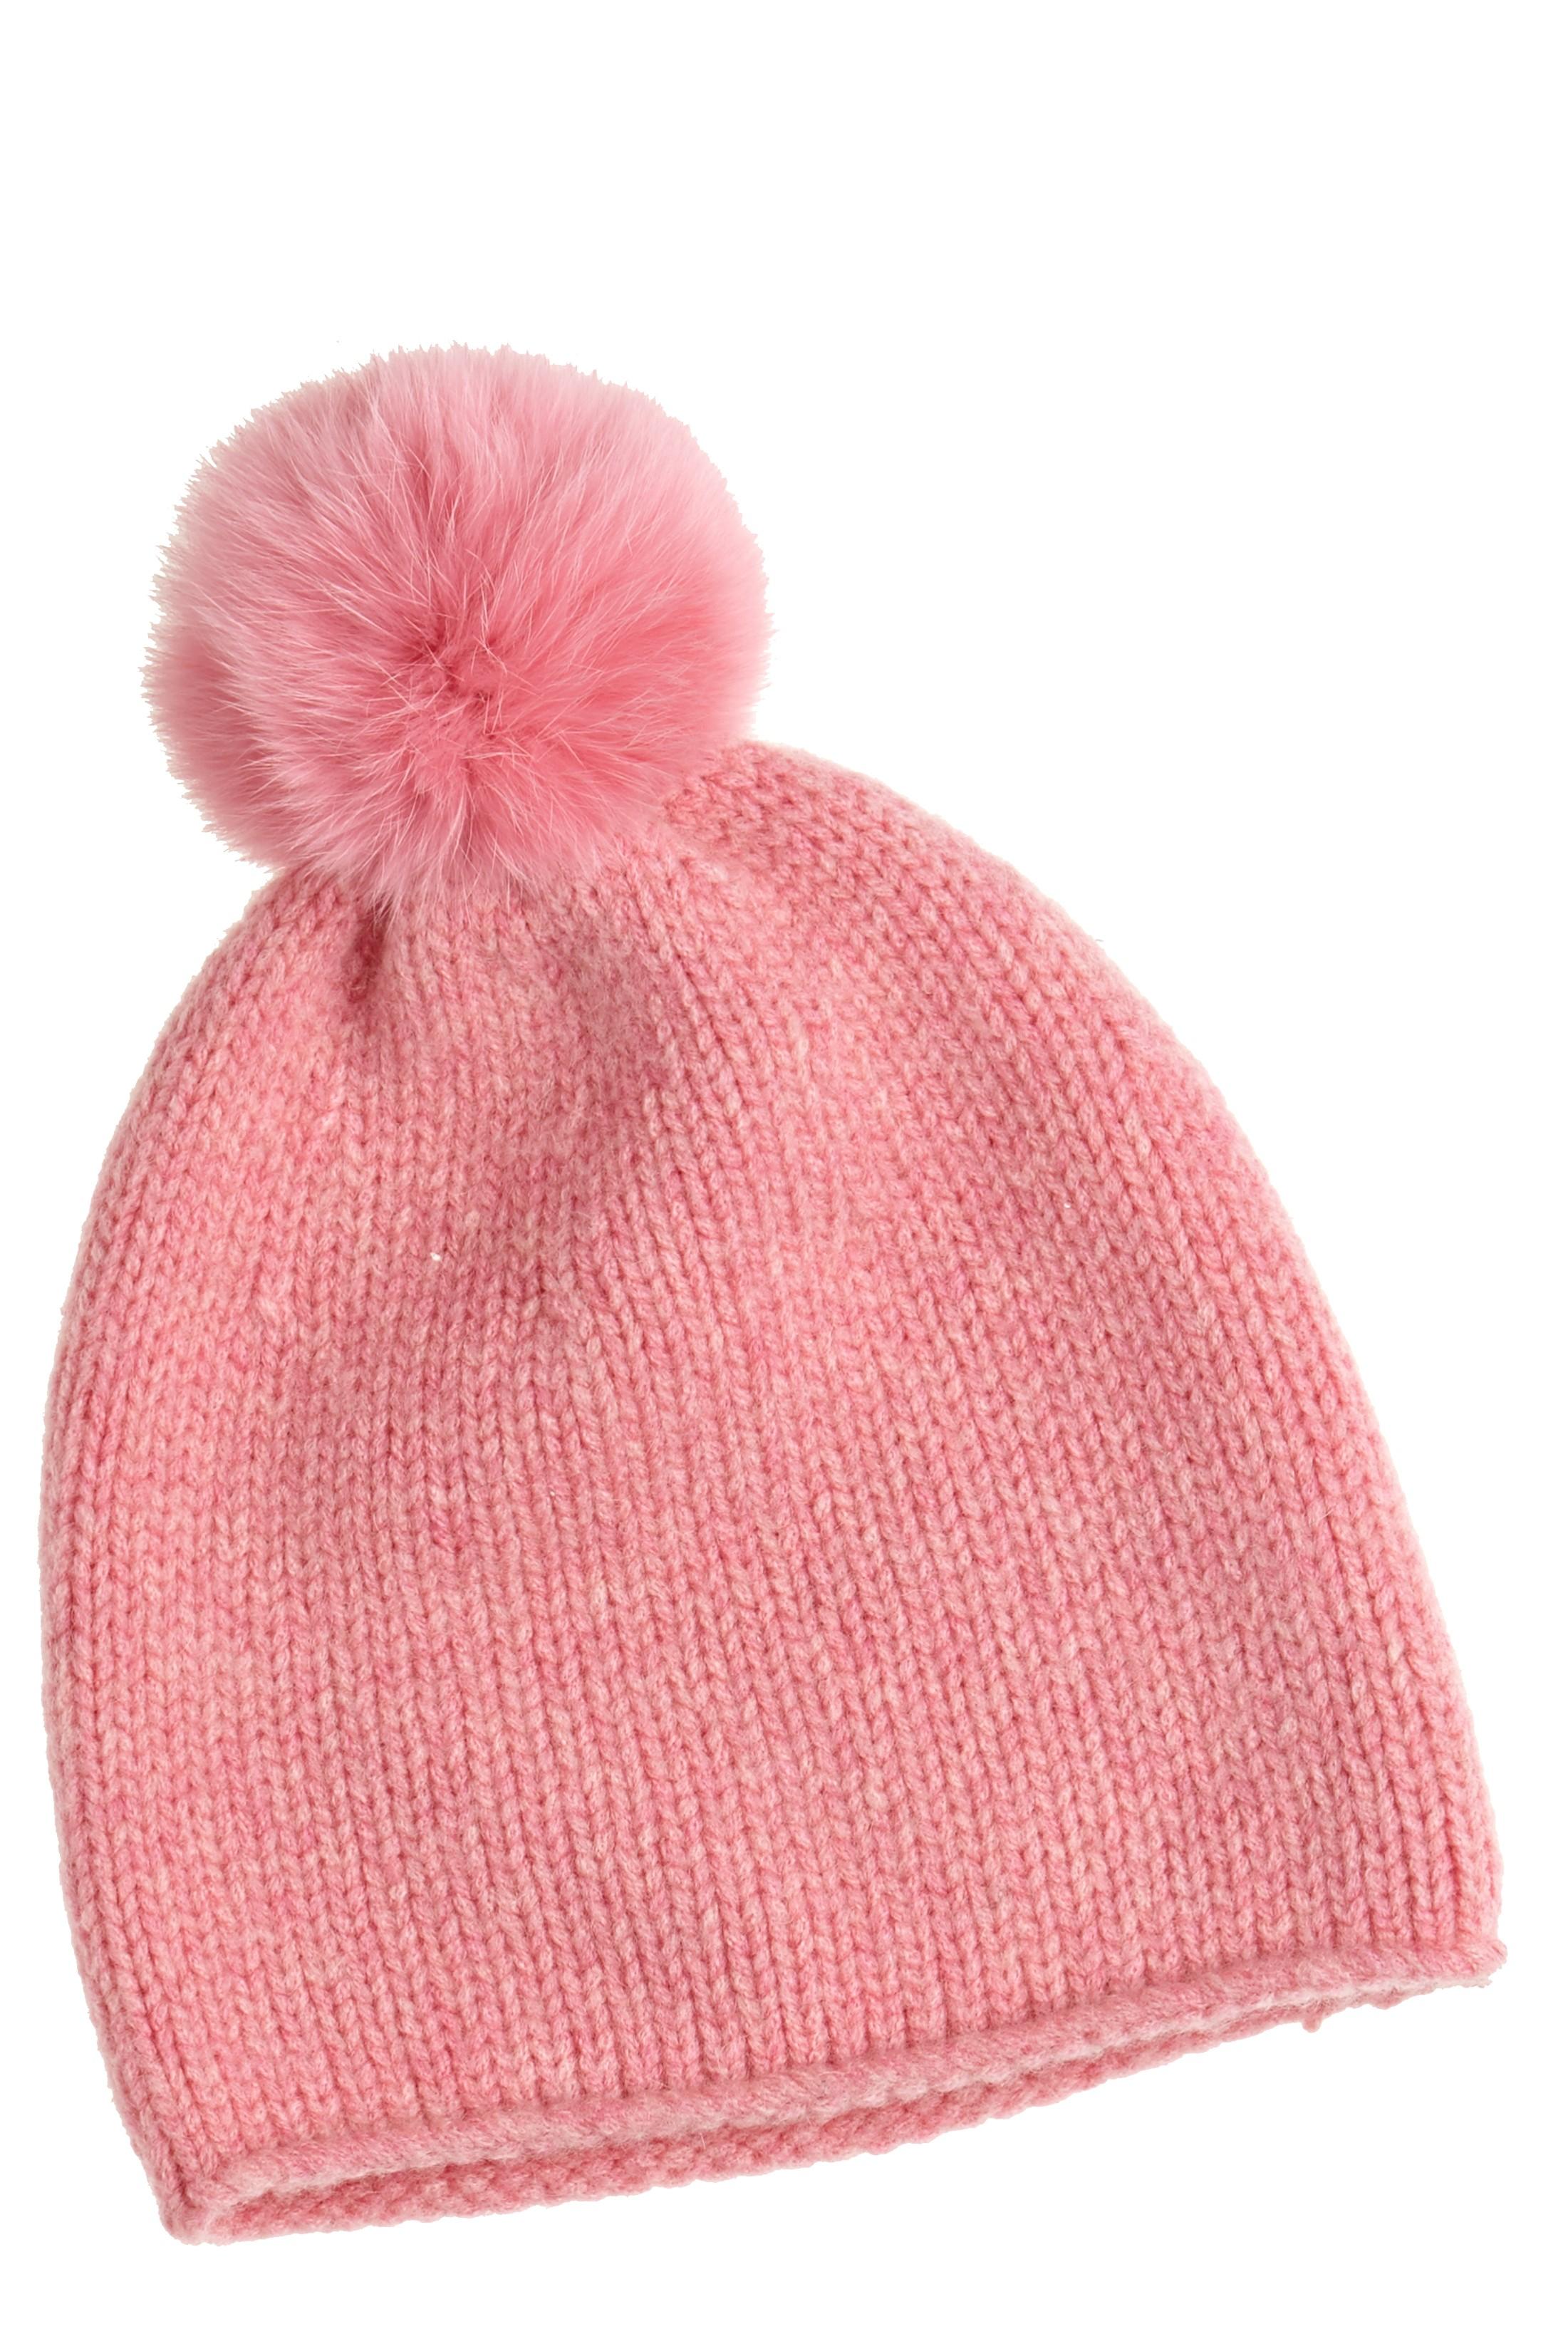 Takara Fur Pom Pom Hat | Calypso St. Barth